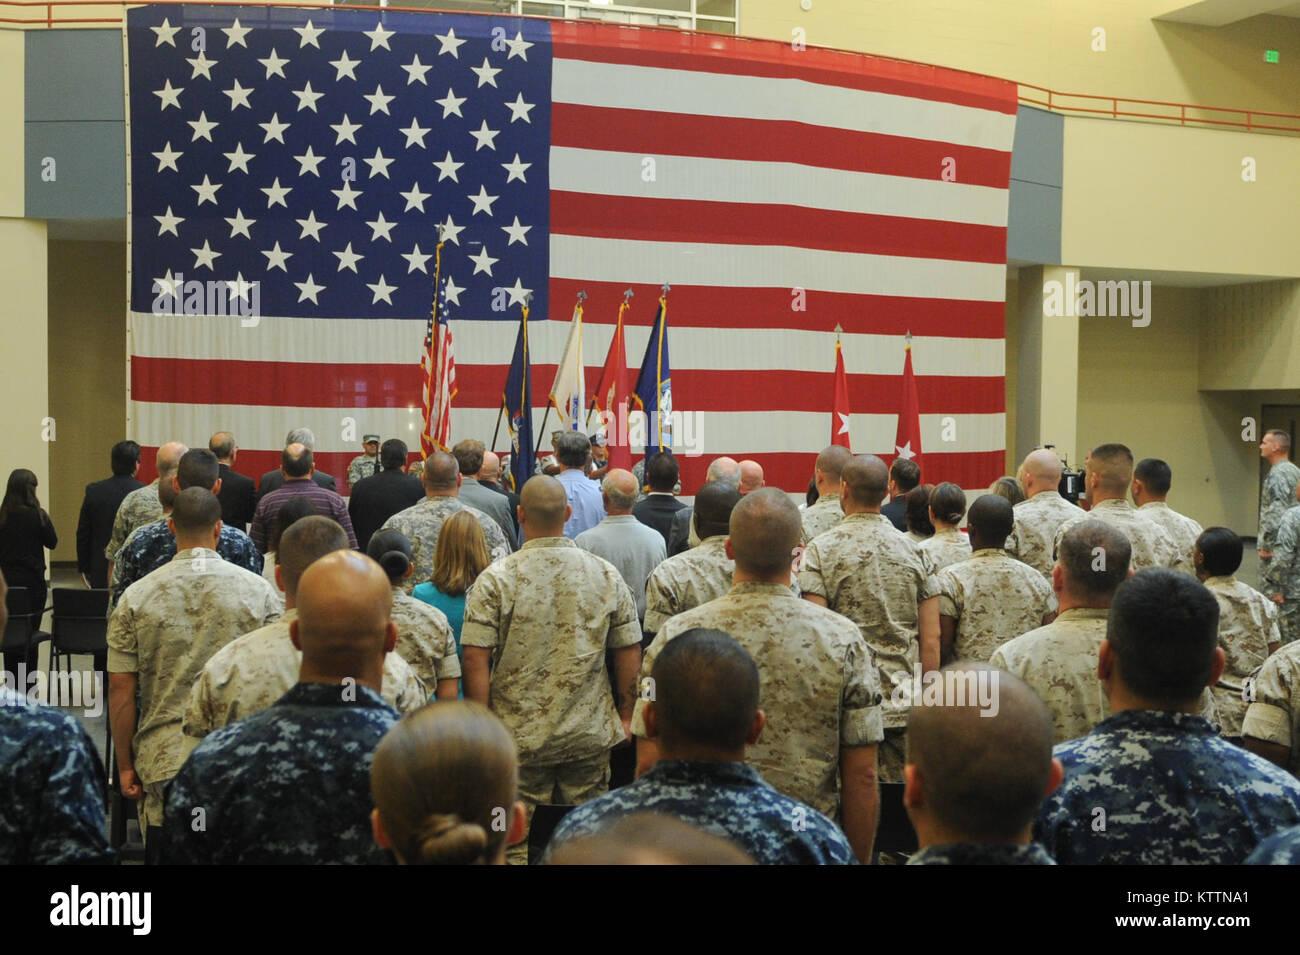 Armed Forces Reserve Center Imágenes De Stock & Armed Forces Reserve ...